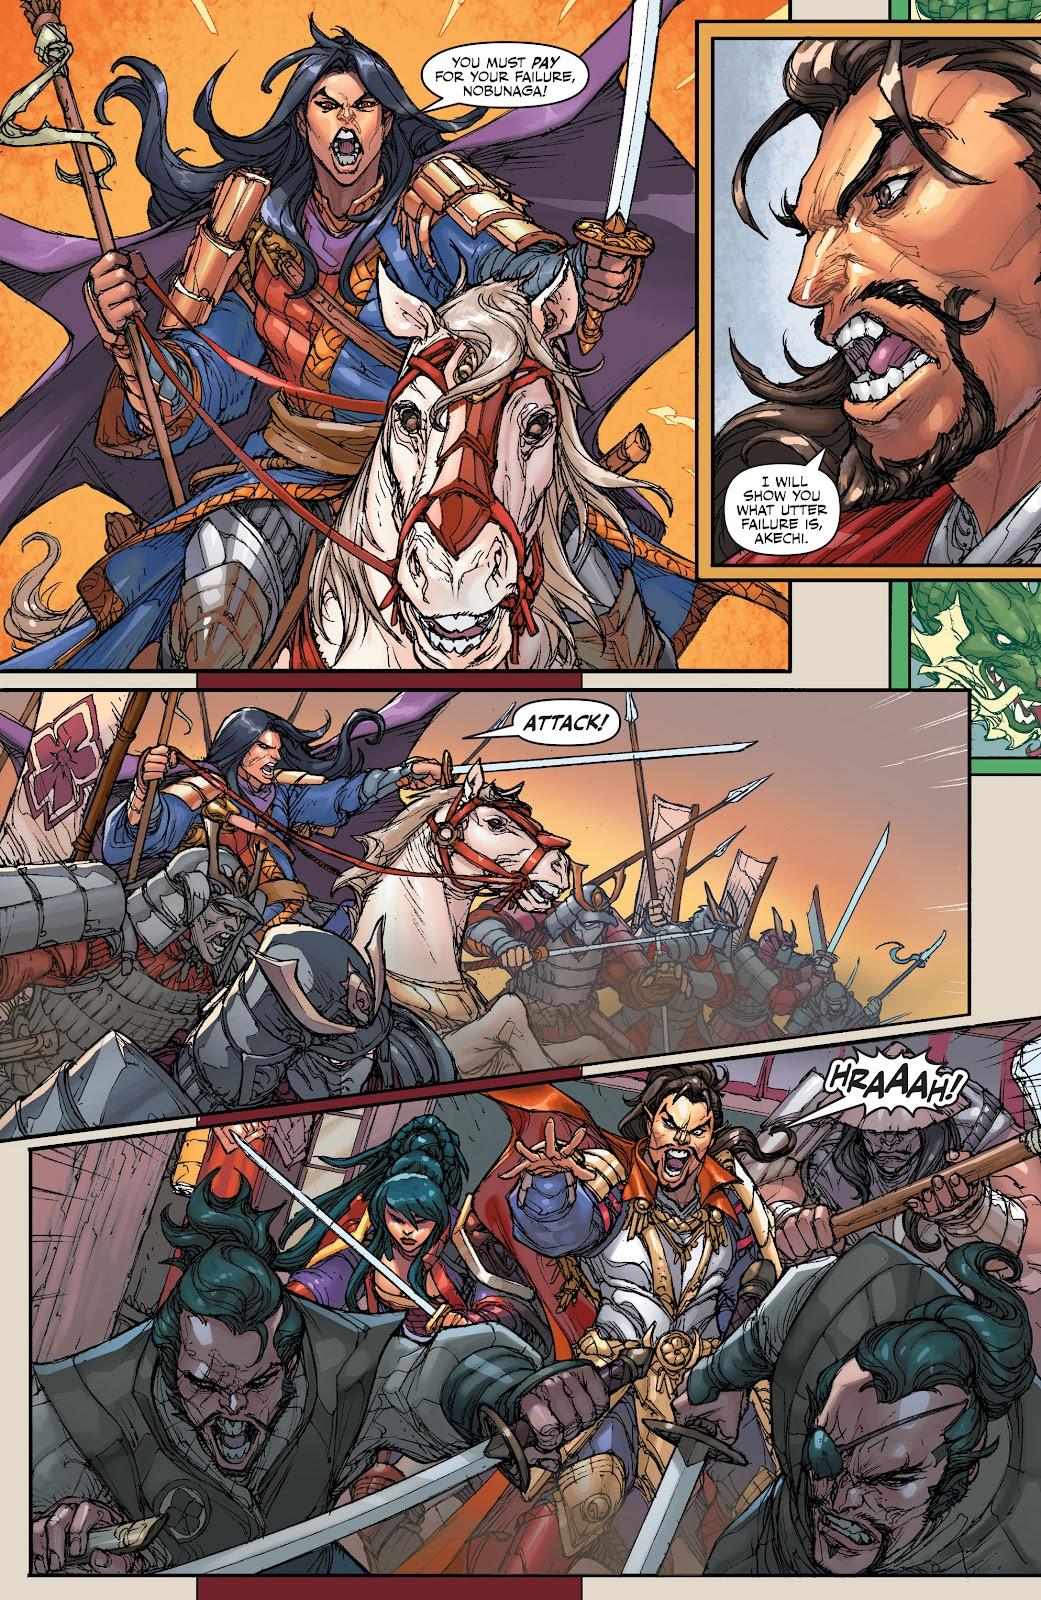 Read online Oniba: Swords of the Demon comic -  Issue # Full - 7